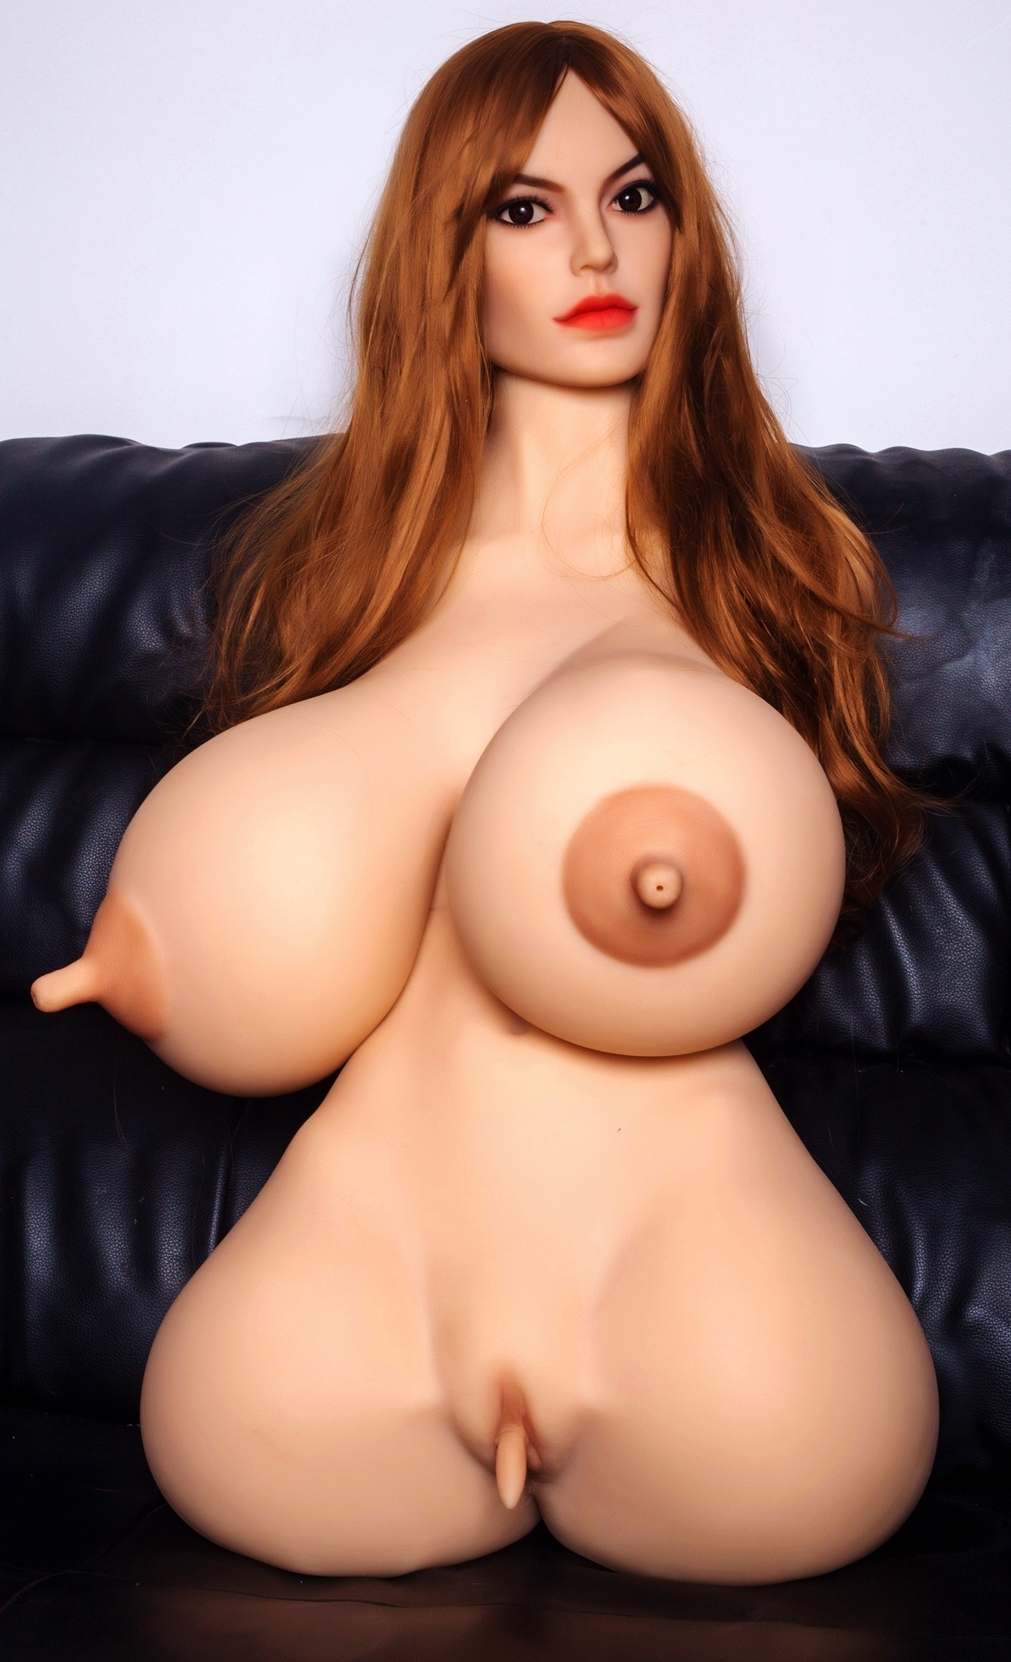 Grosse Nippel Bilder